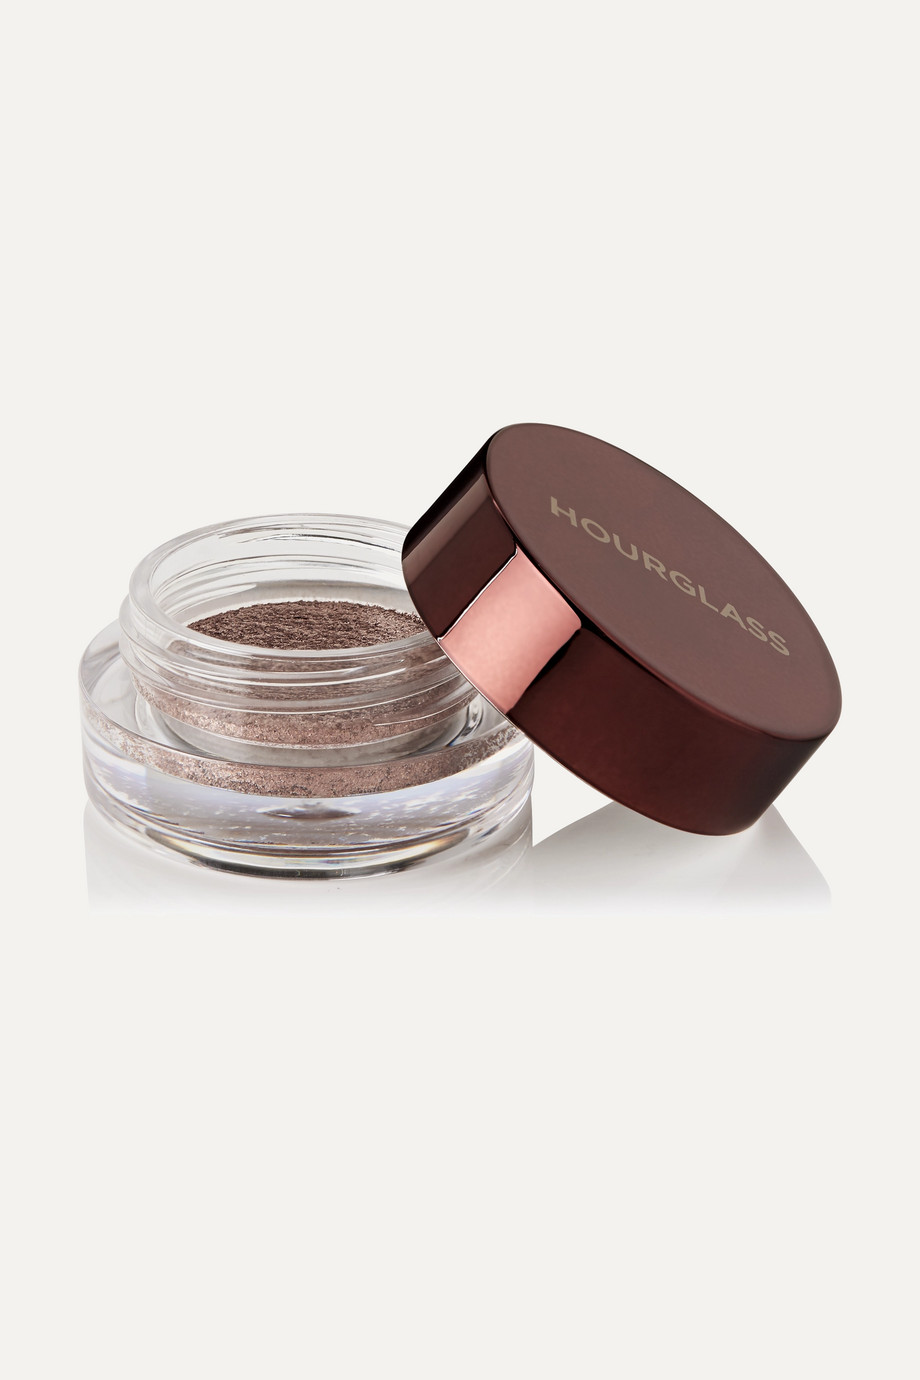 Hourglass Scattered Light Glitter Eyeshadow - Smoke